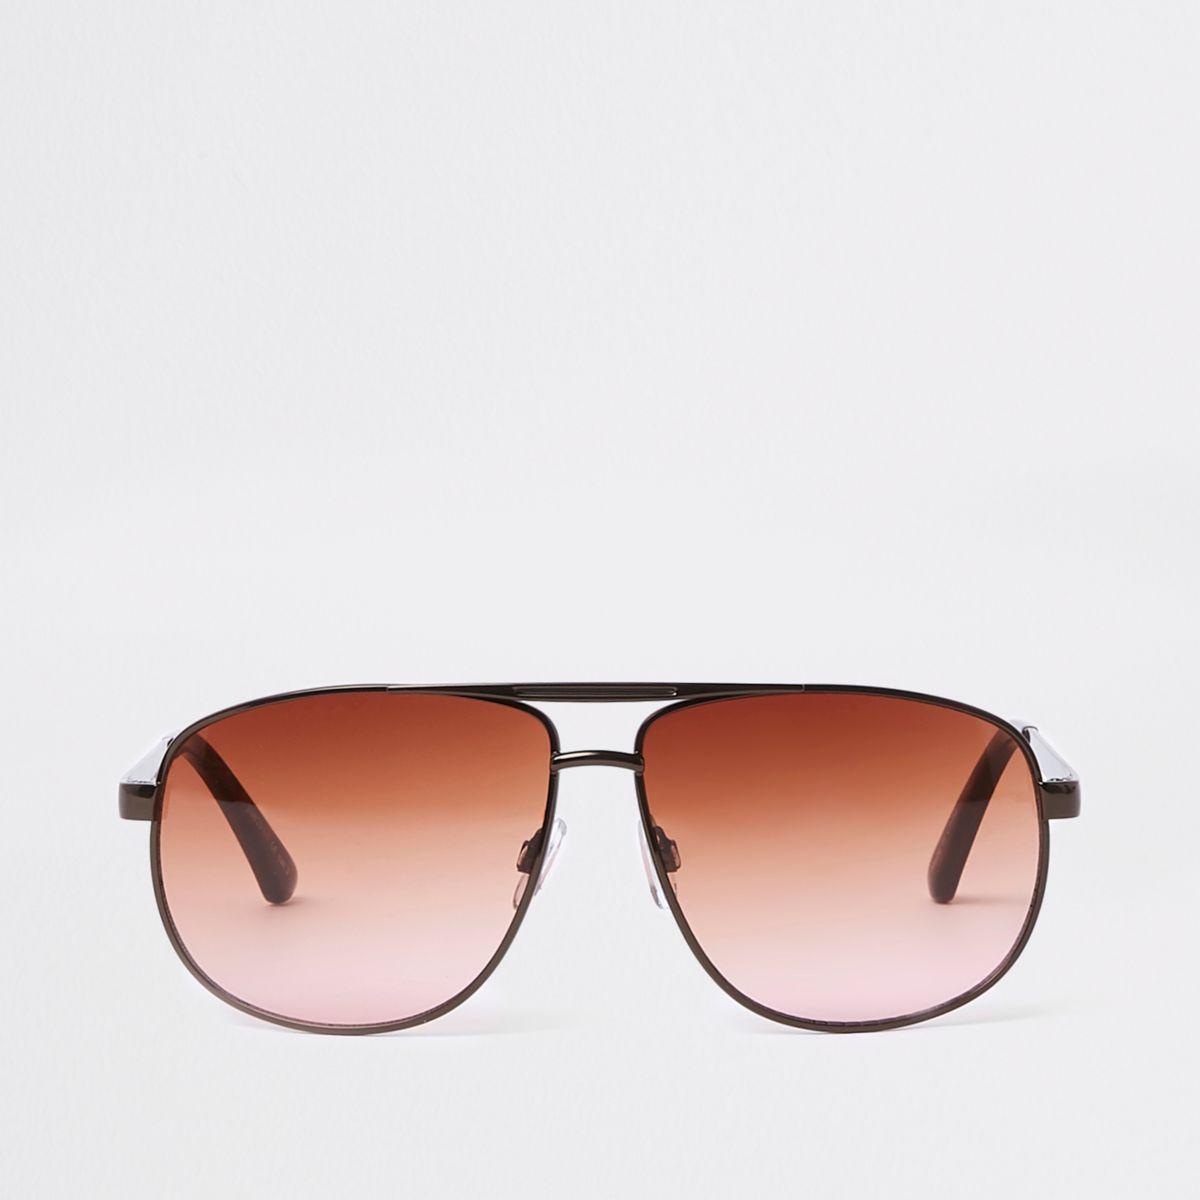 Bronze metal aviator sunglasses